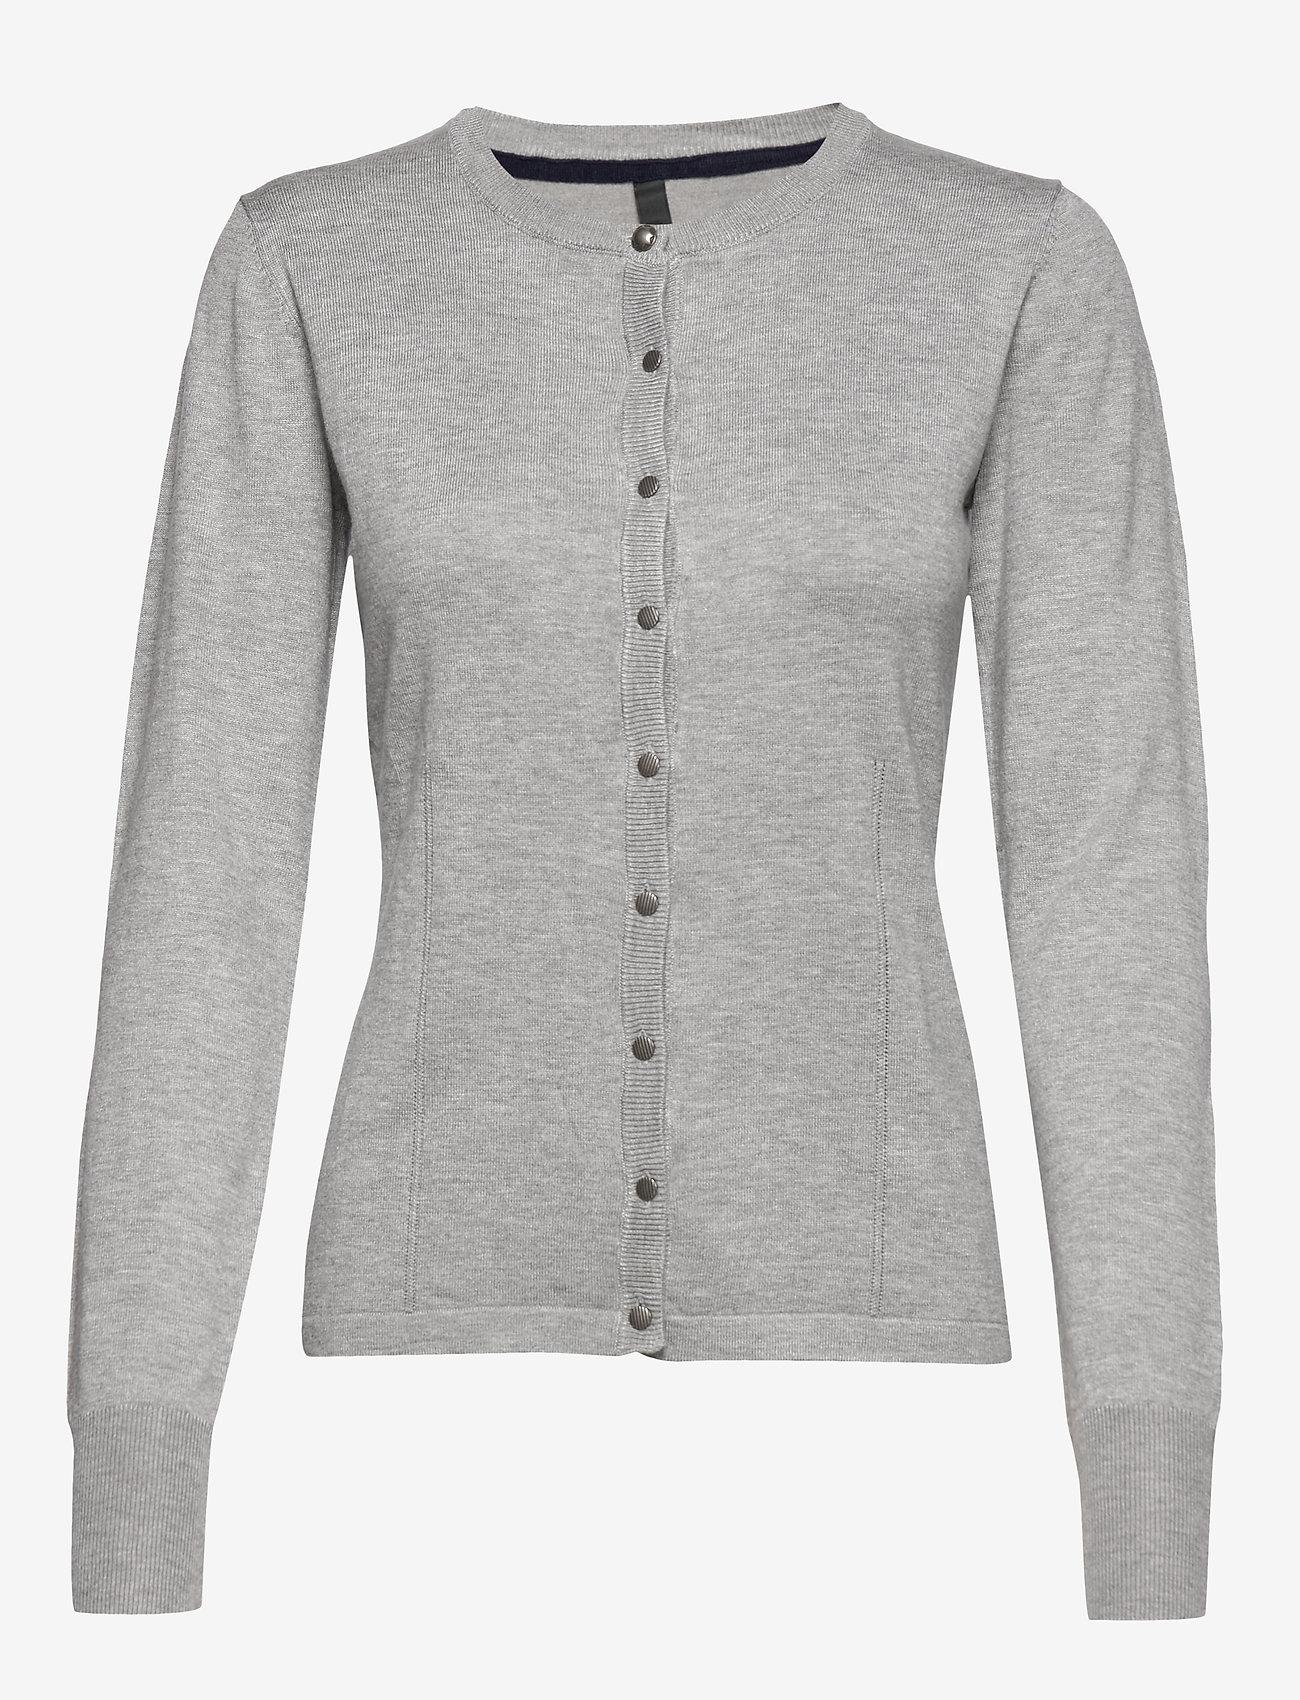 Pulz Jeans - PZSARA L/S Cardigan - cardigans - light grey melange - 0